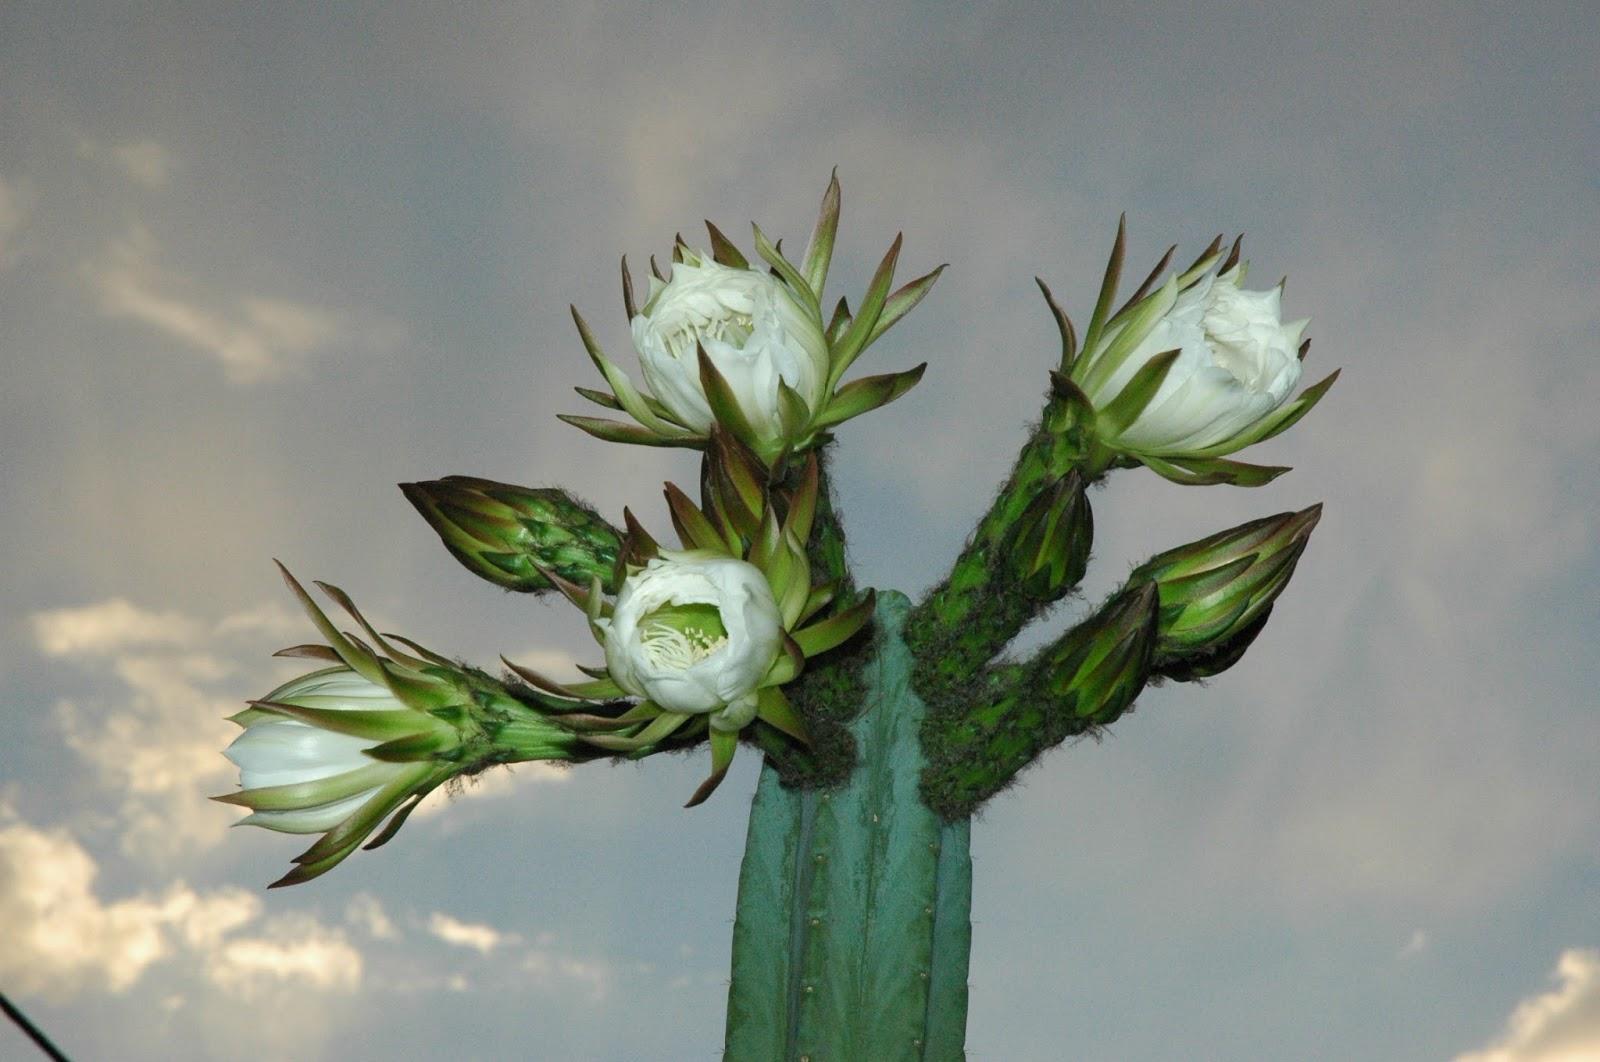 San Pedro Cactus - Wachuma - Medicinal plants